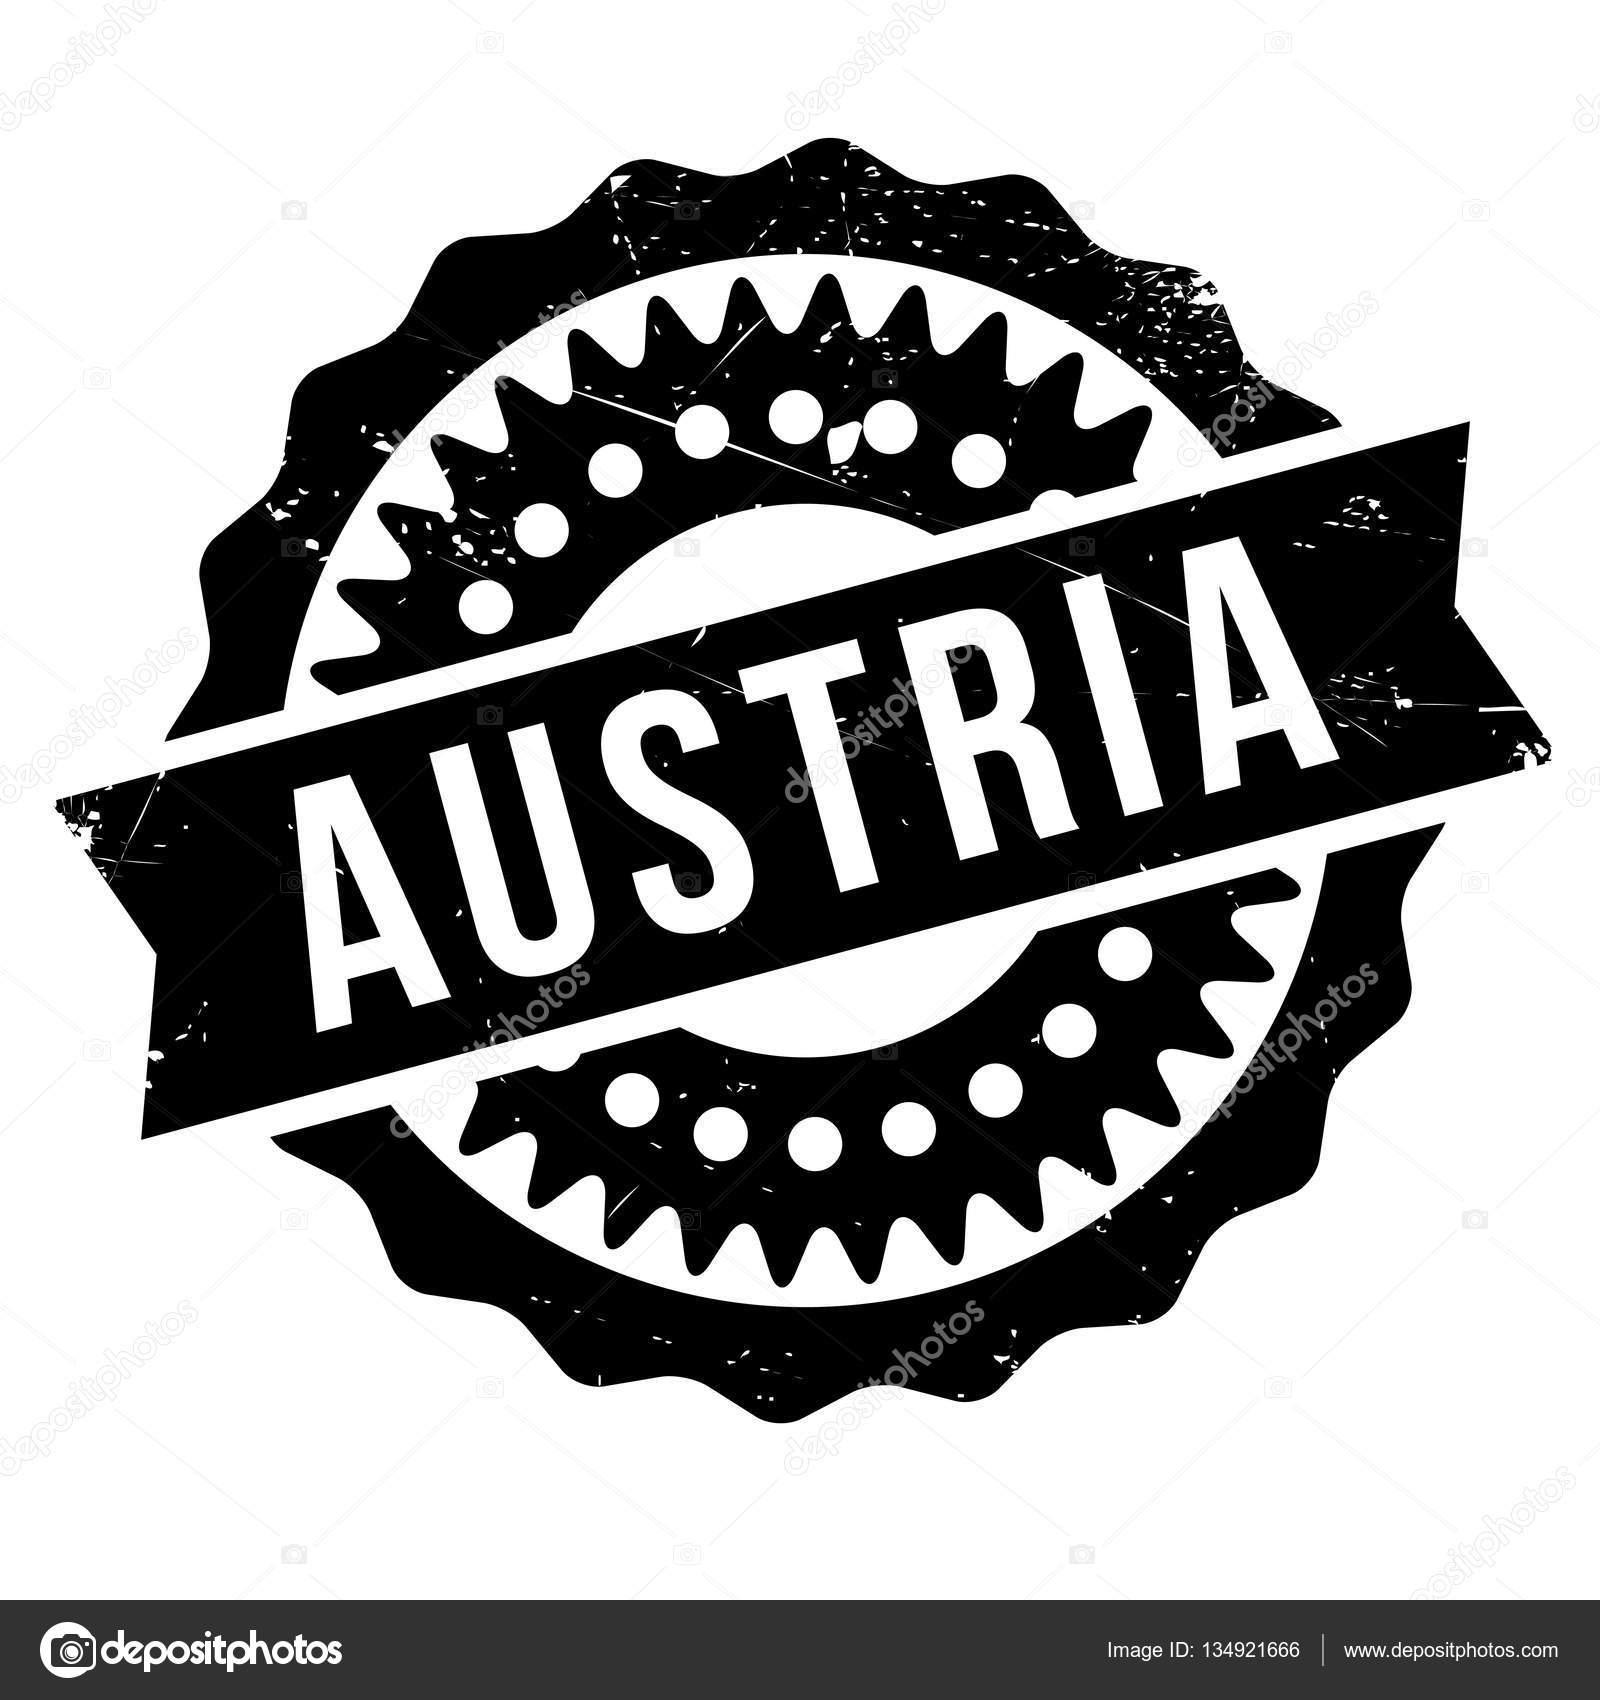 Austria Stamp Rubber Grunge Stock Illustration